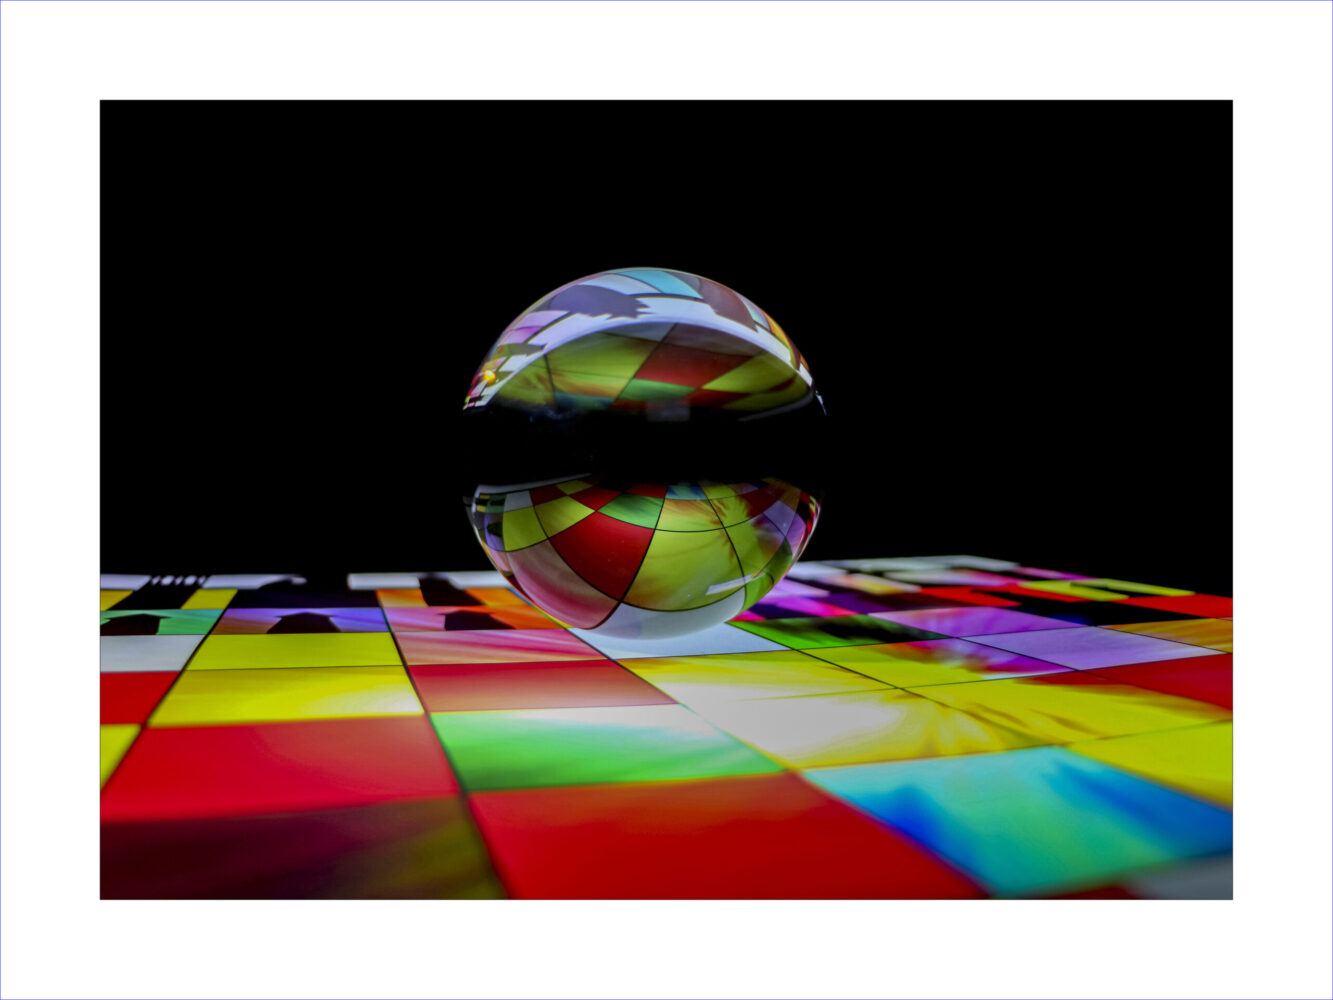 Chessboard & Sphere_2349